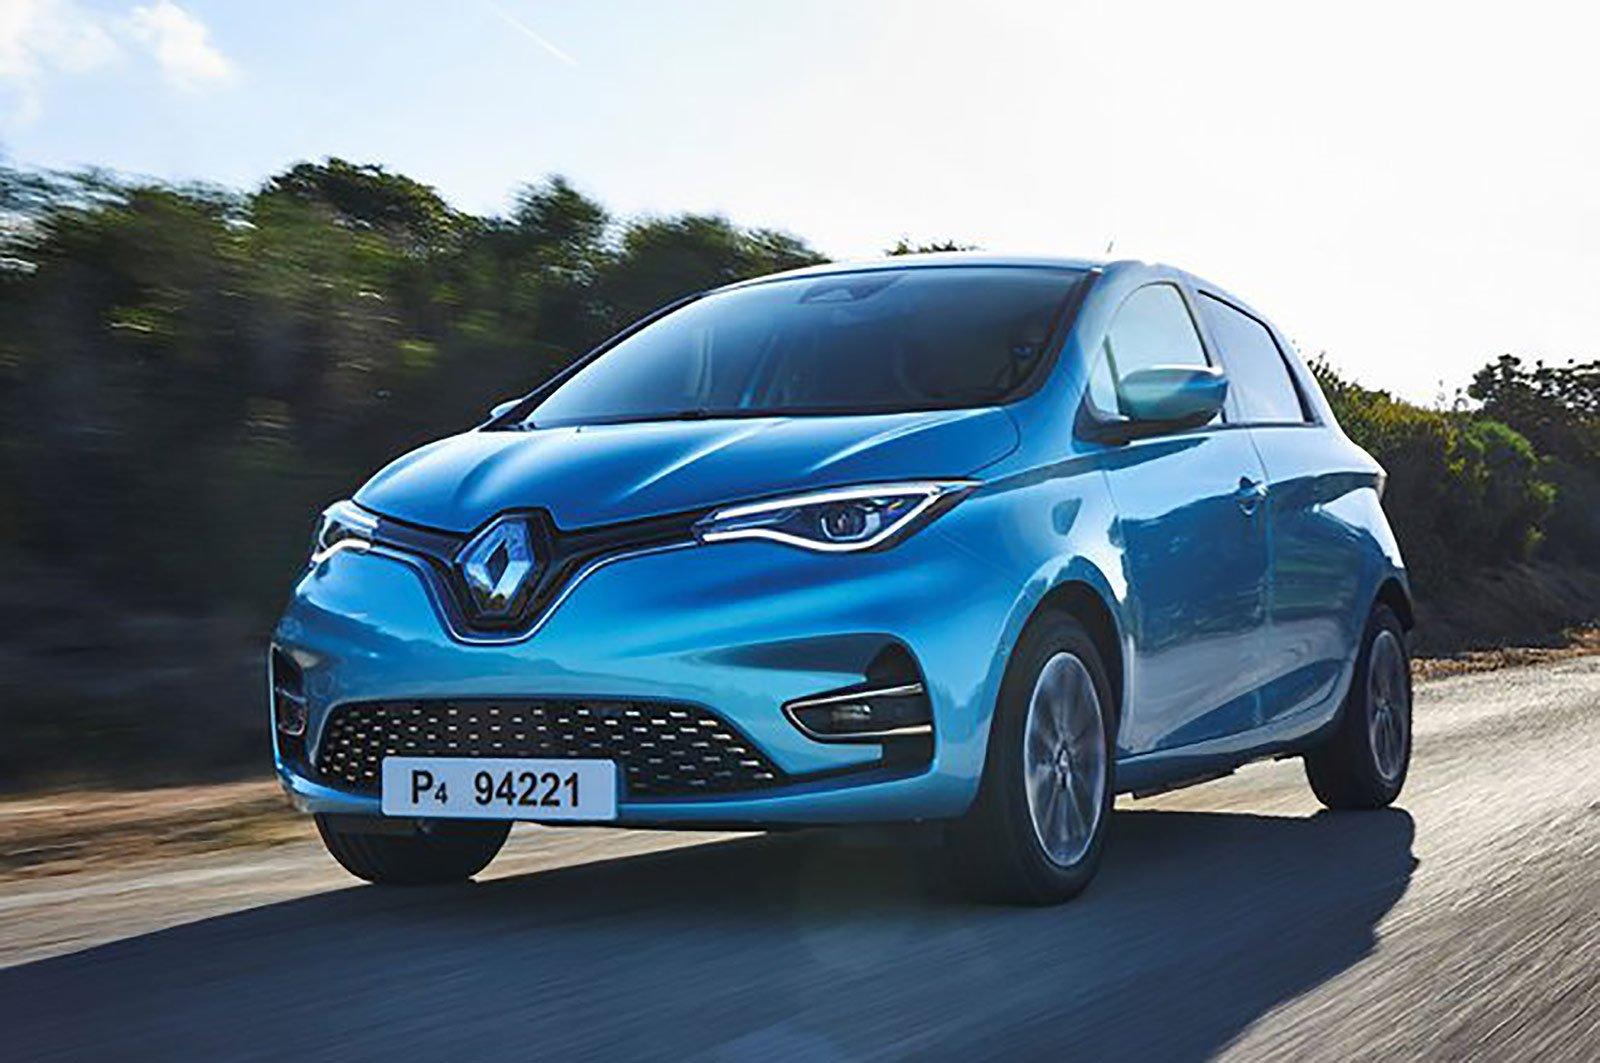 Renault Zoe front three quarters